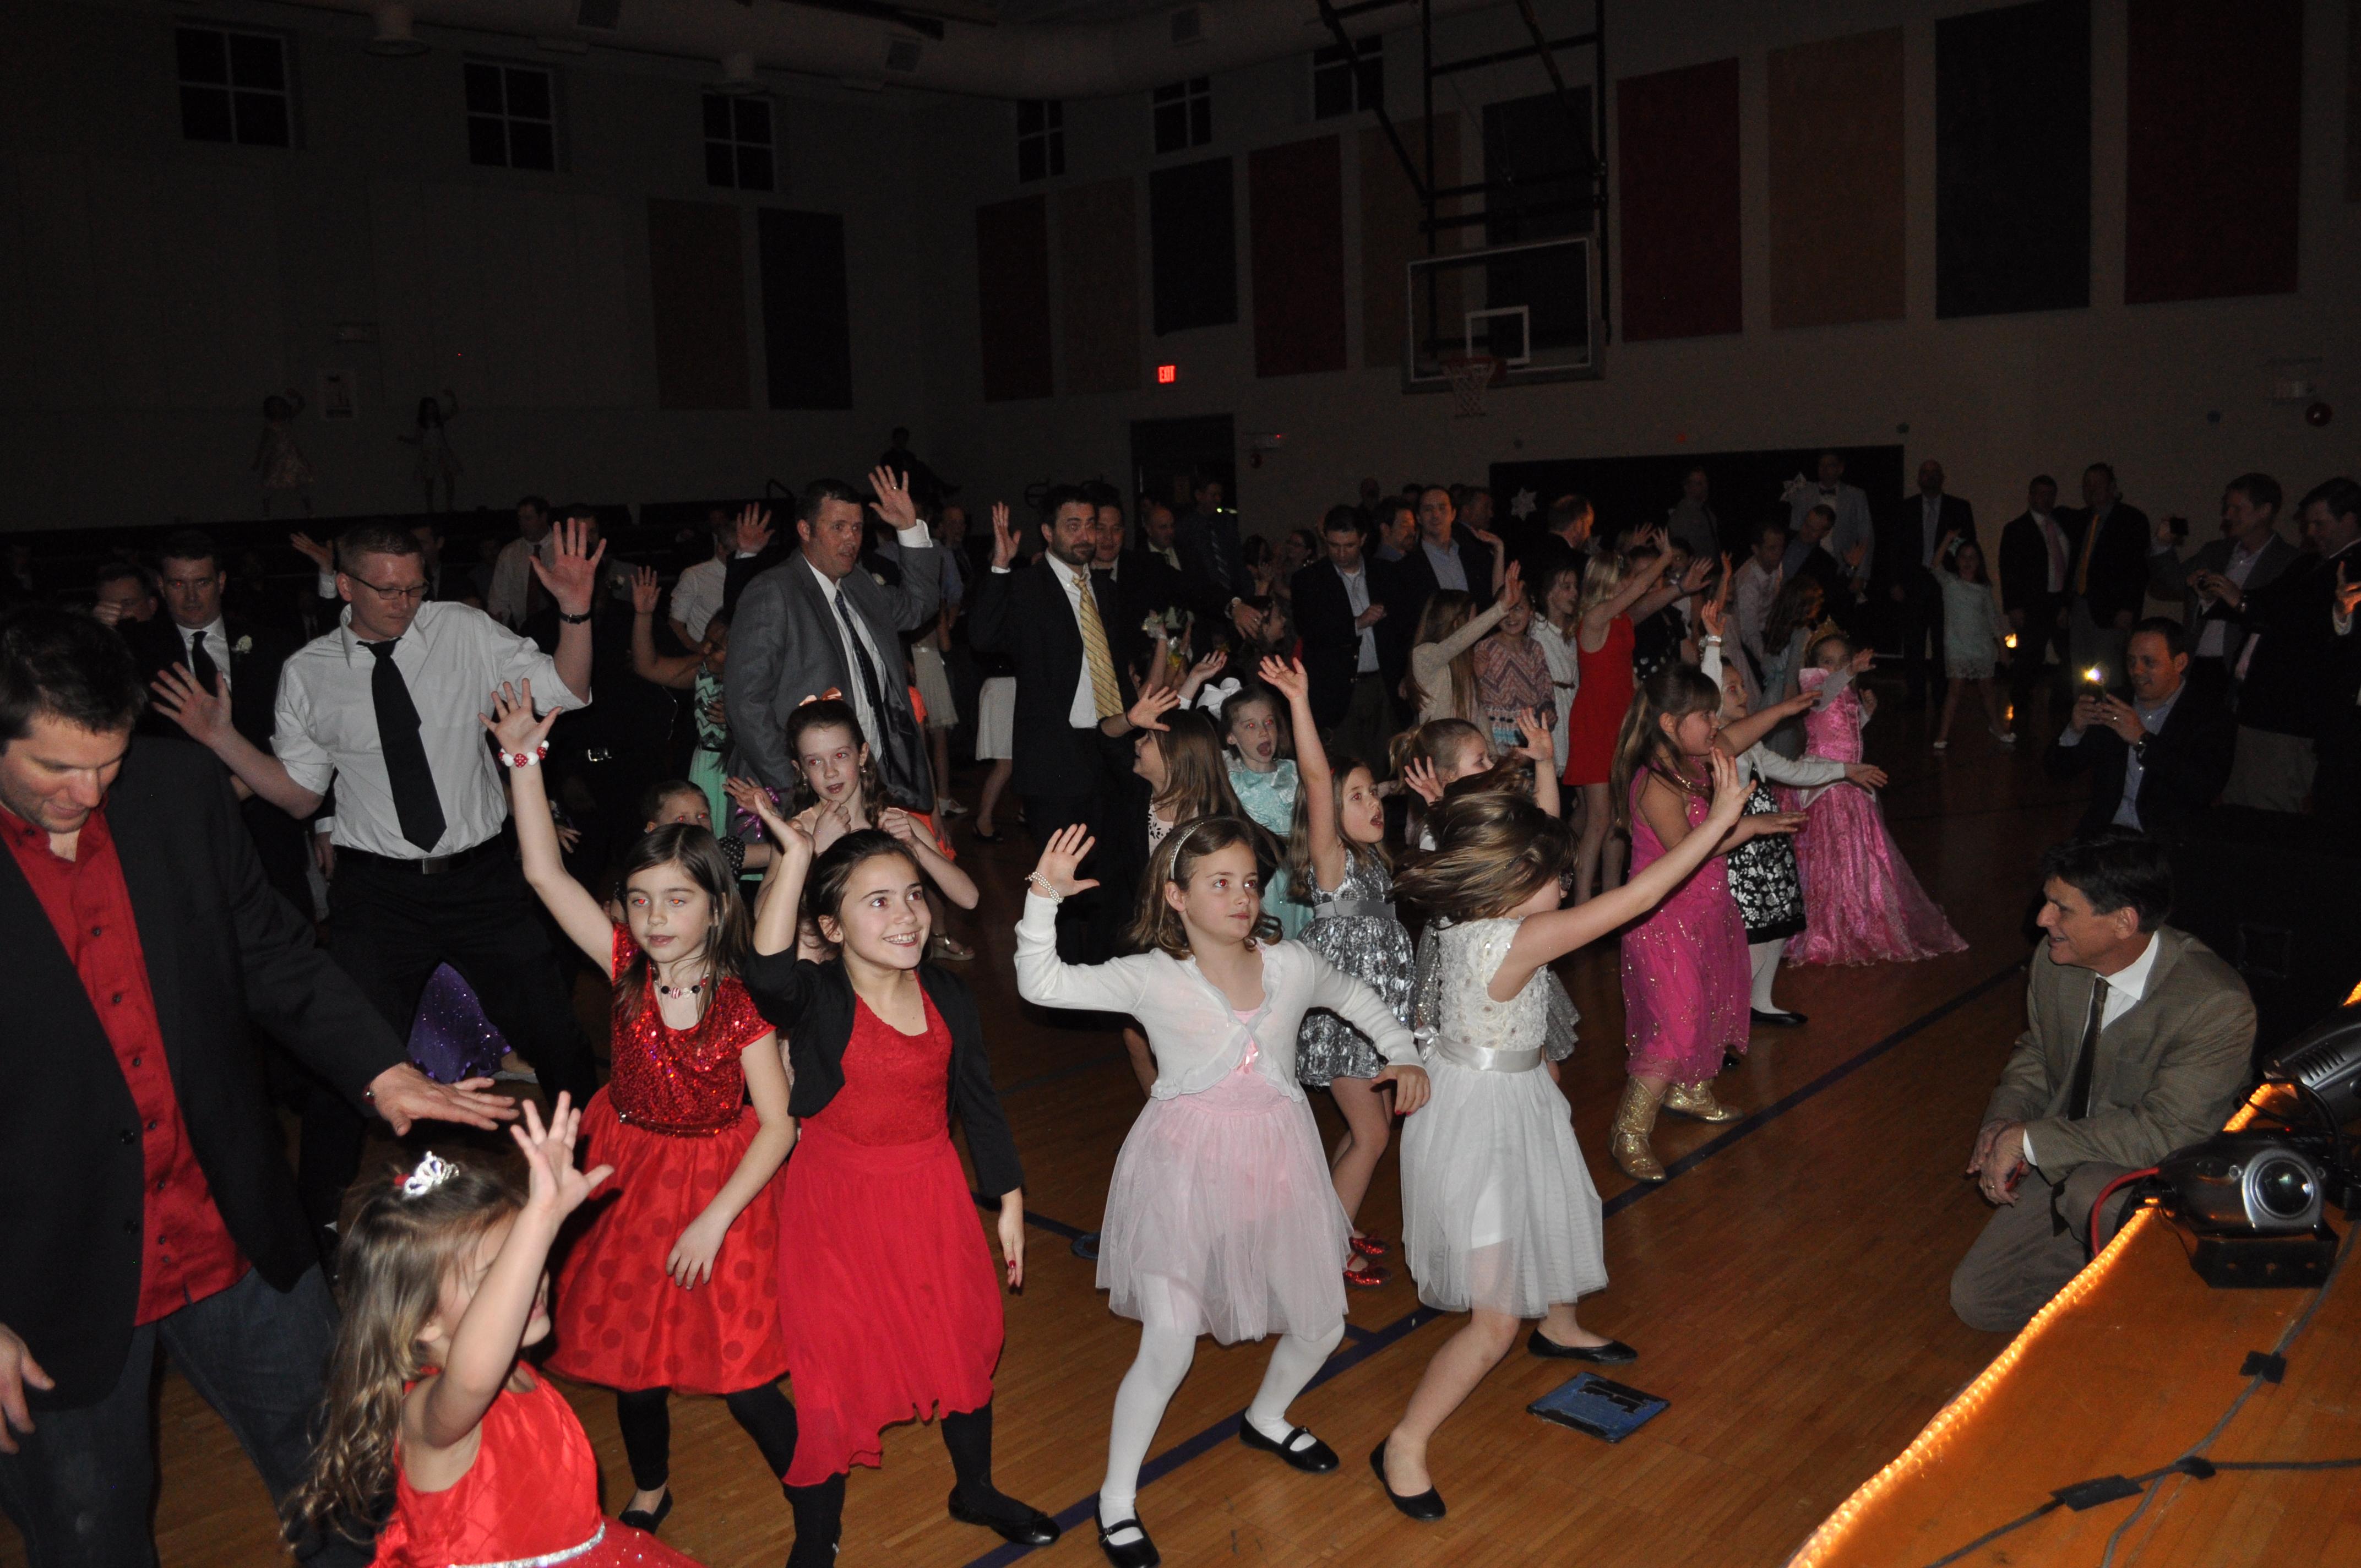 Daddy Daughter Dance @ Winstead - 5651.8KB